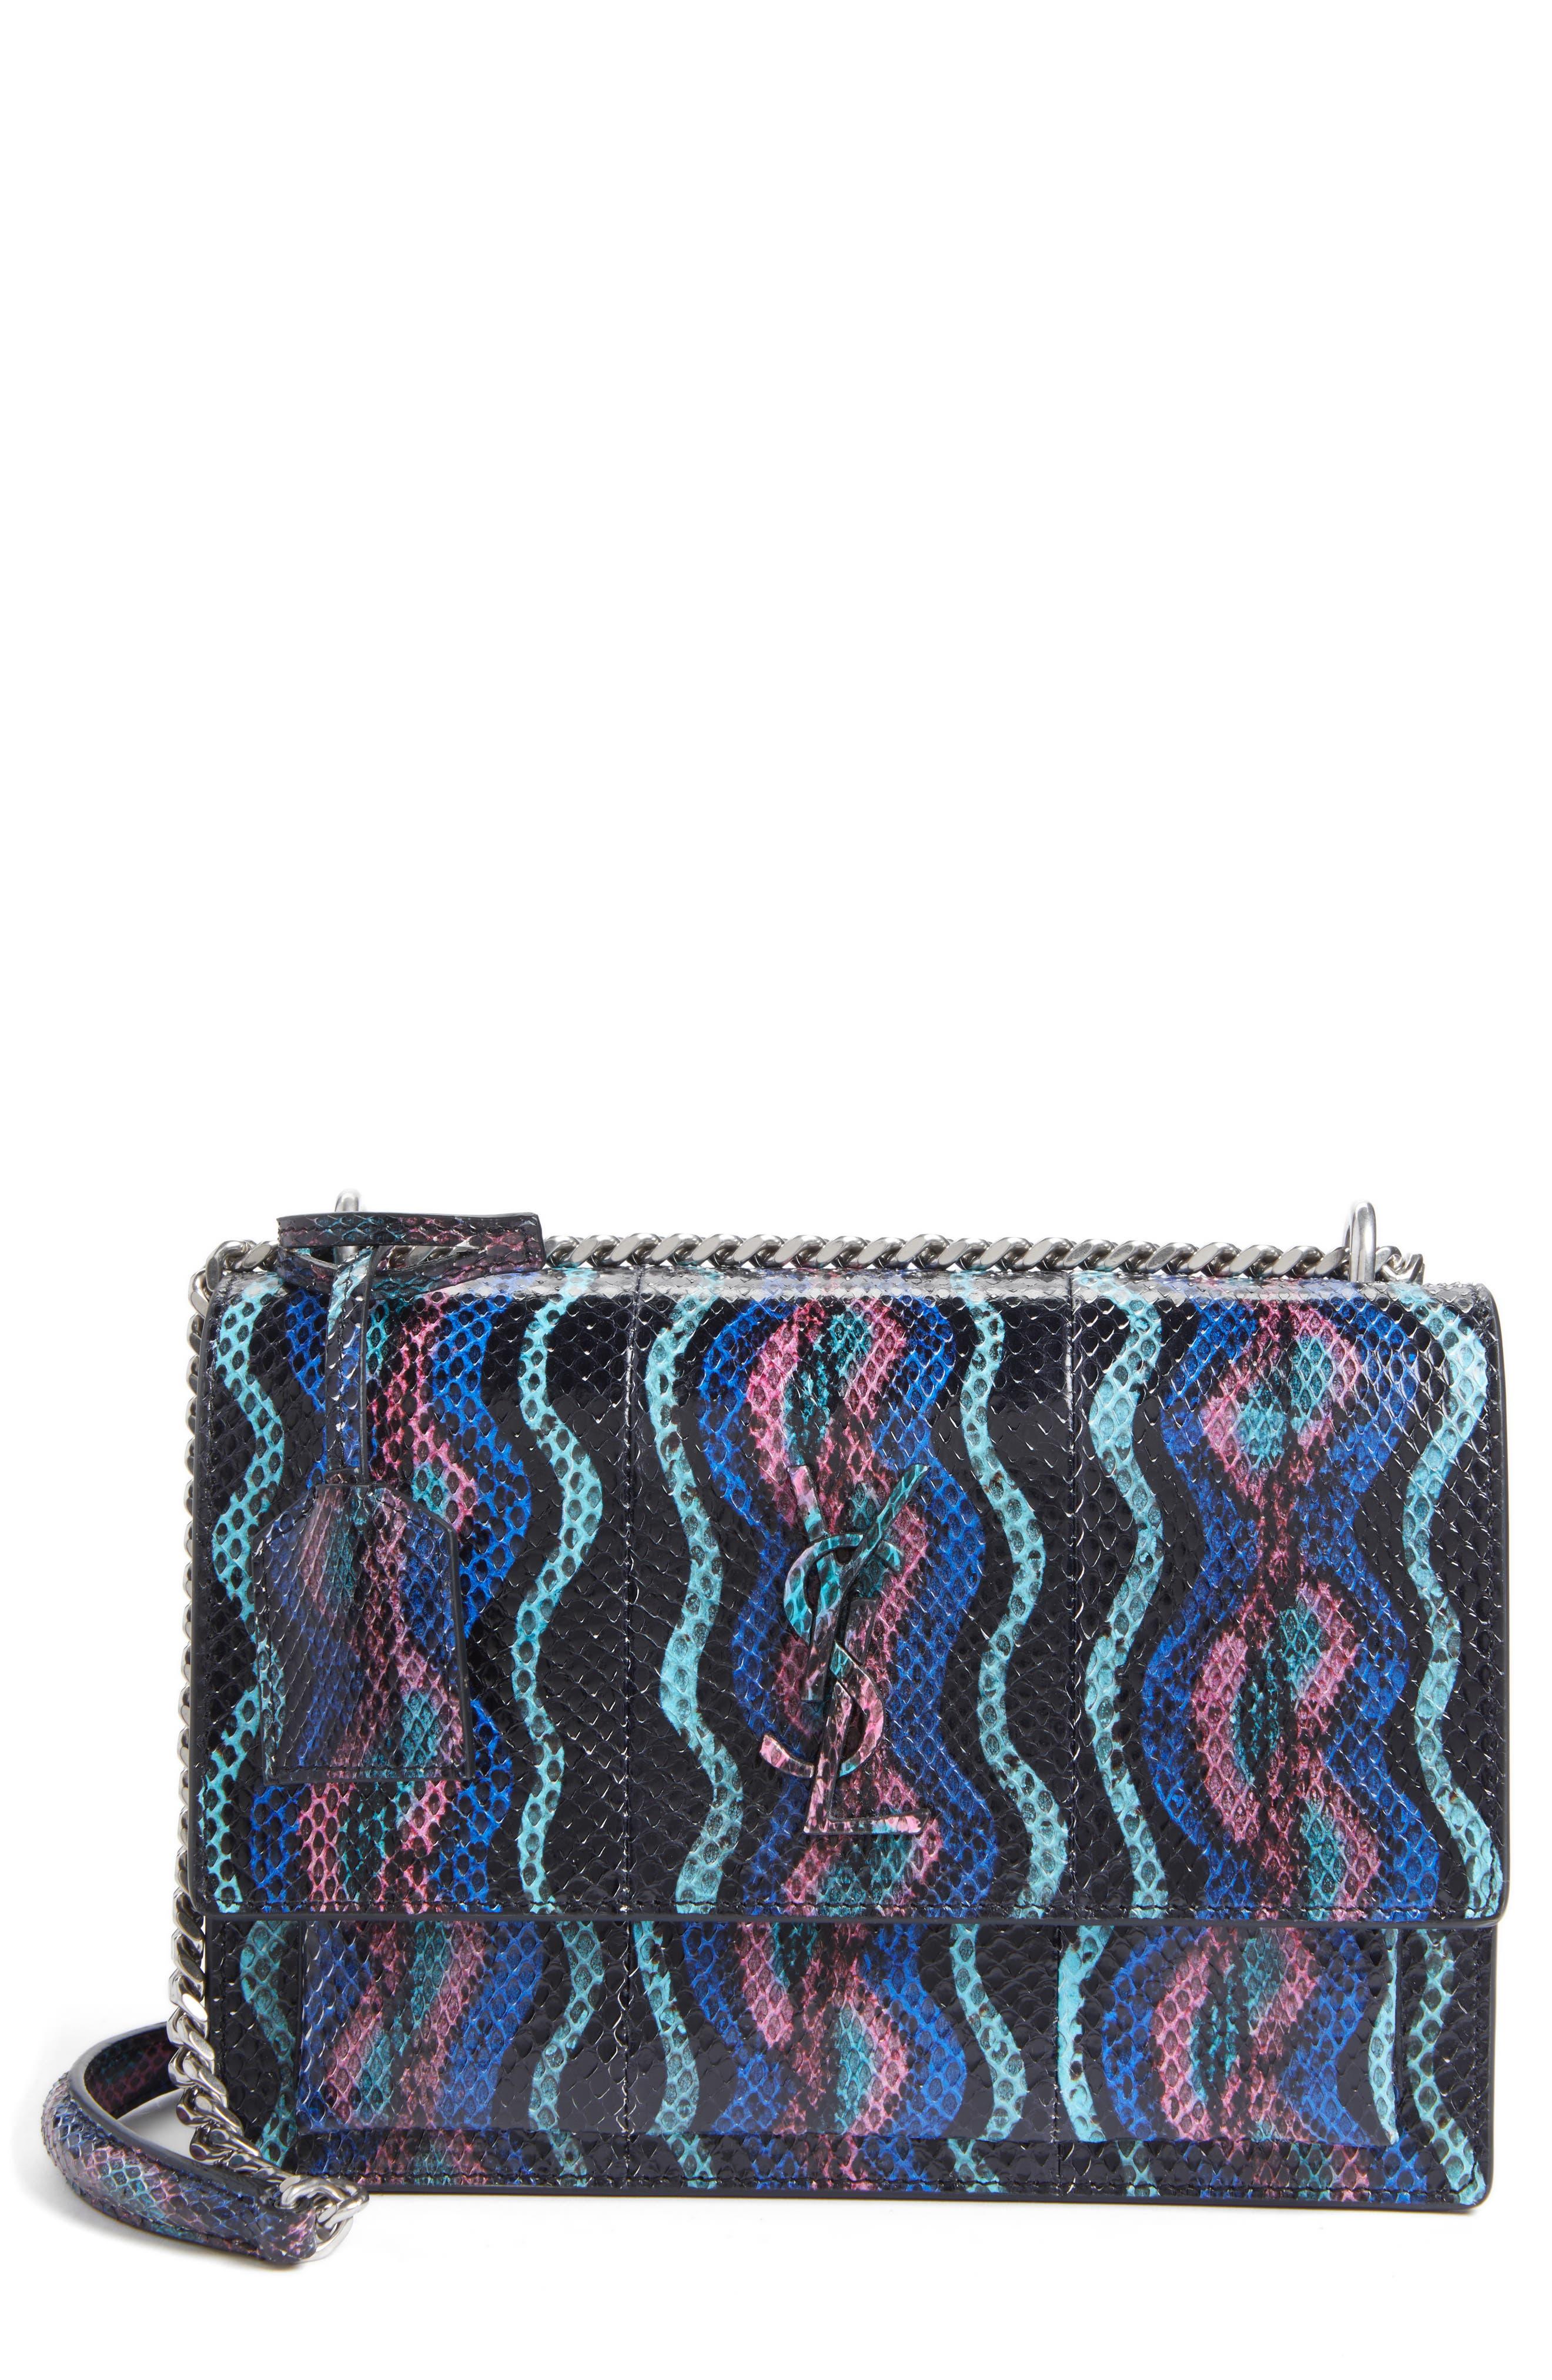 Medium Monogram Sunset Genuine Snakeskin Crossbody Bag,                         Main,                         color, Black Multi